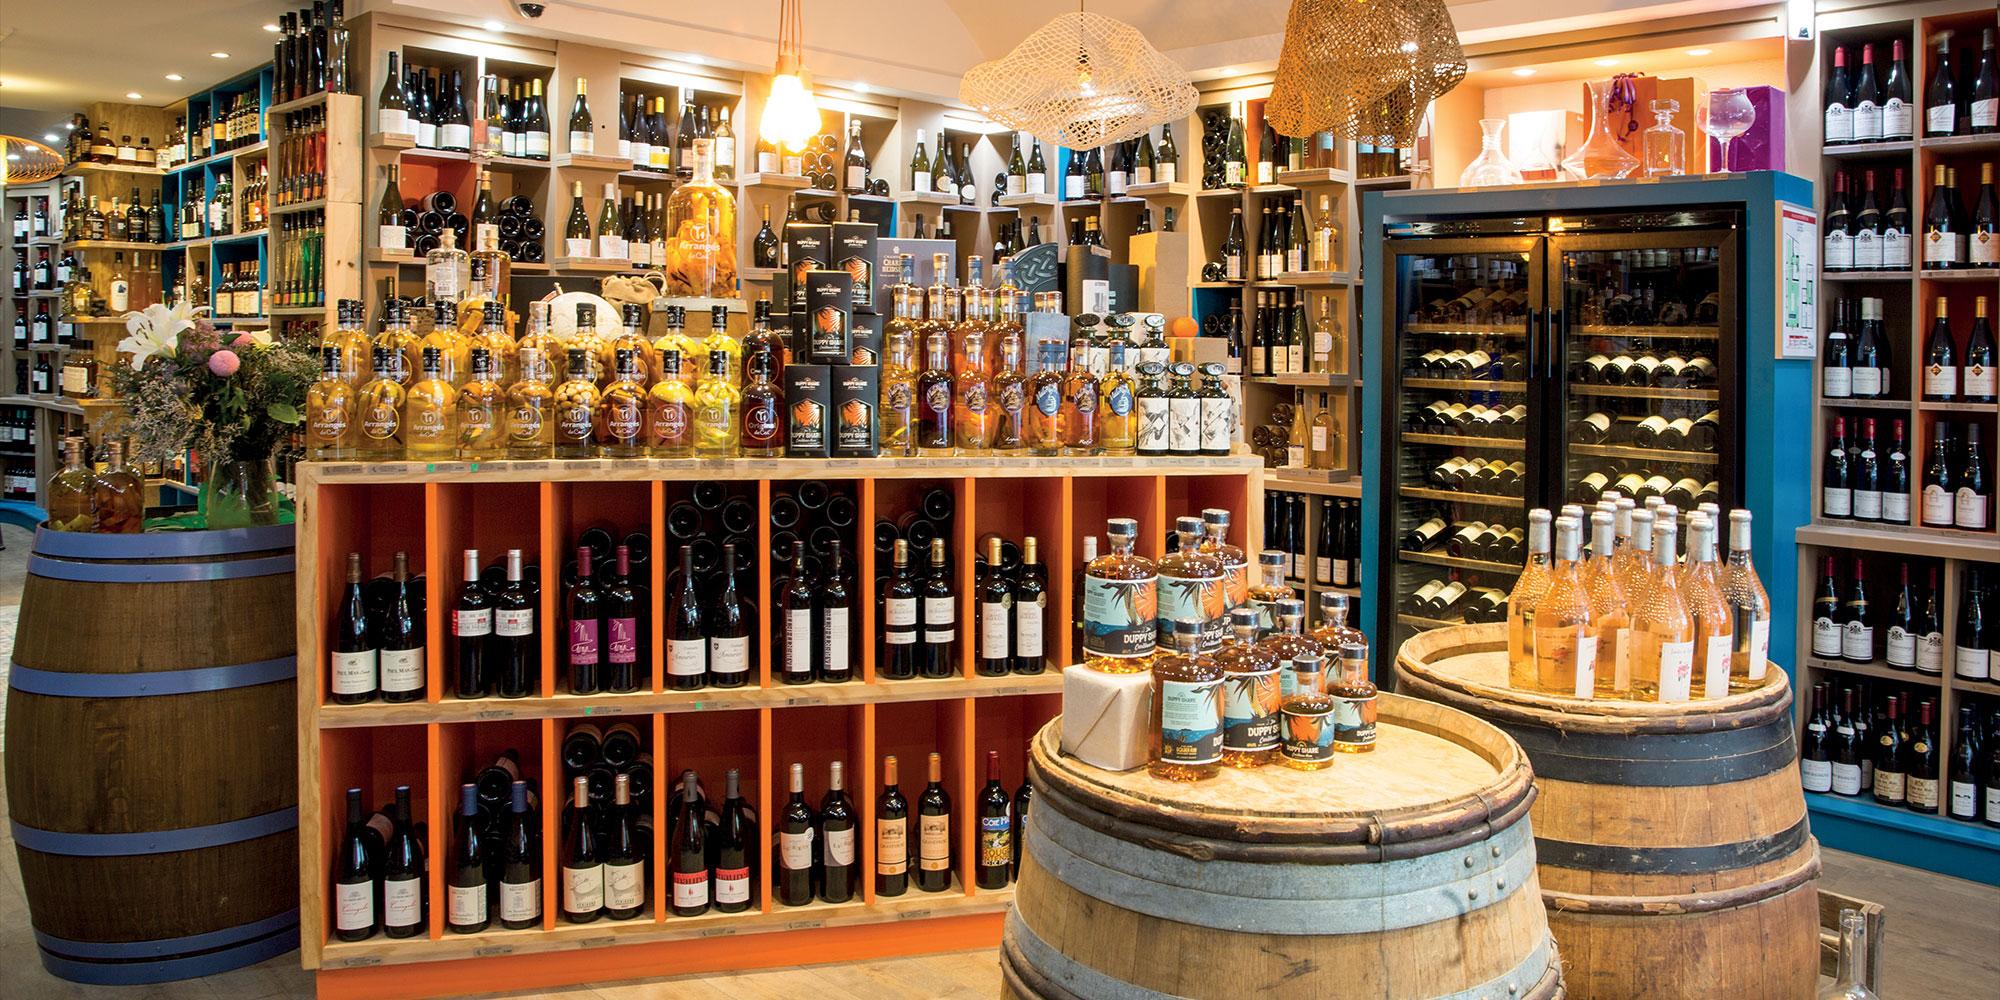 caves bérigny vins et spiritueux